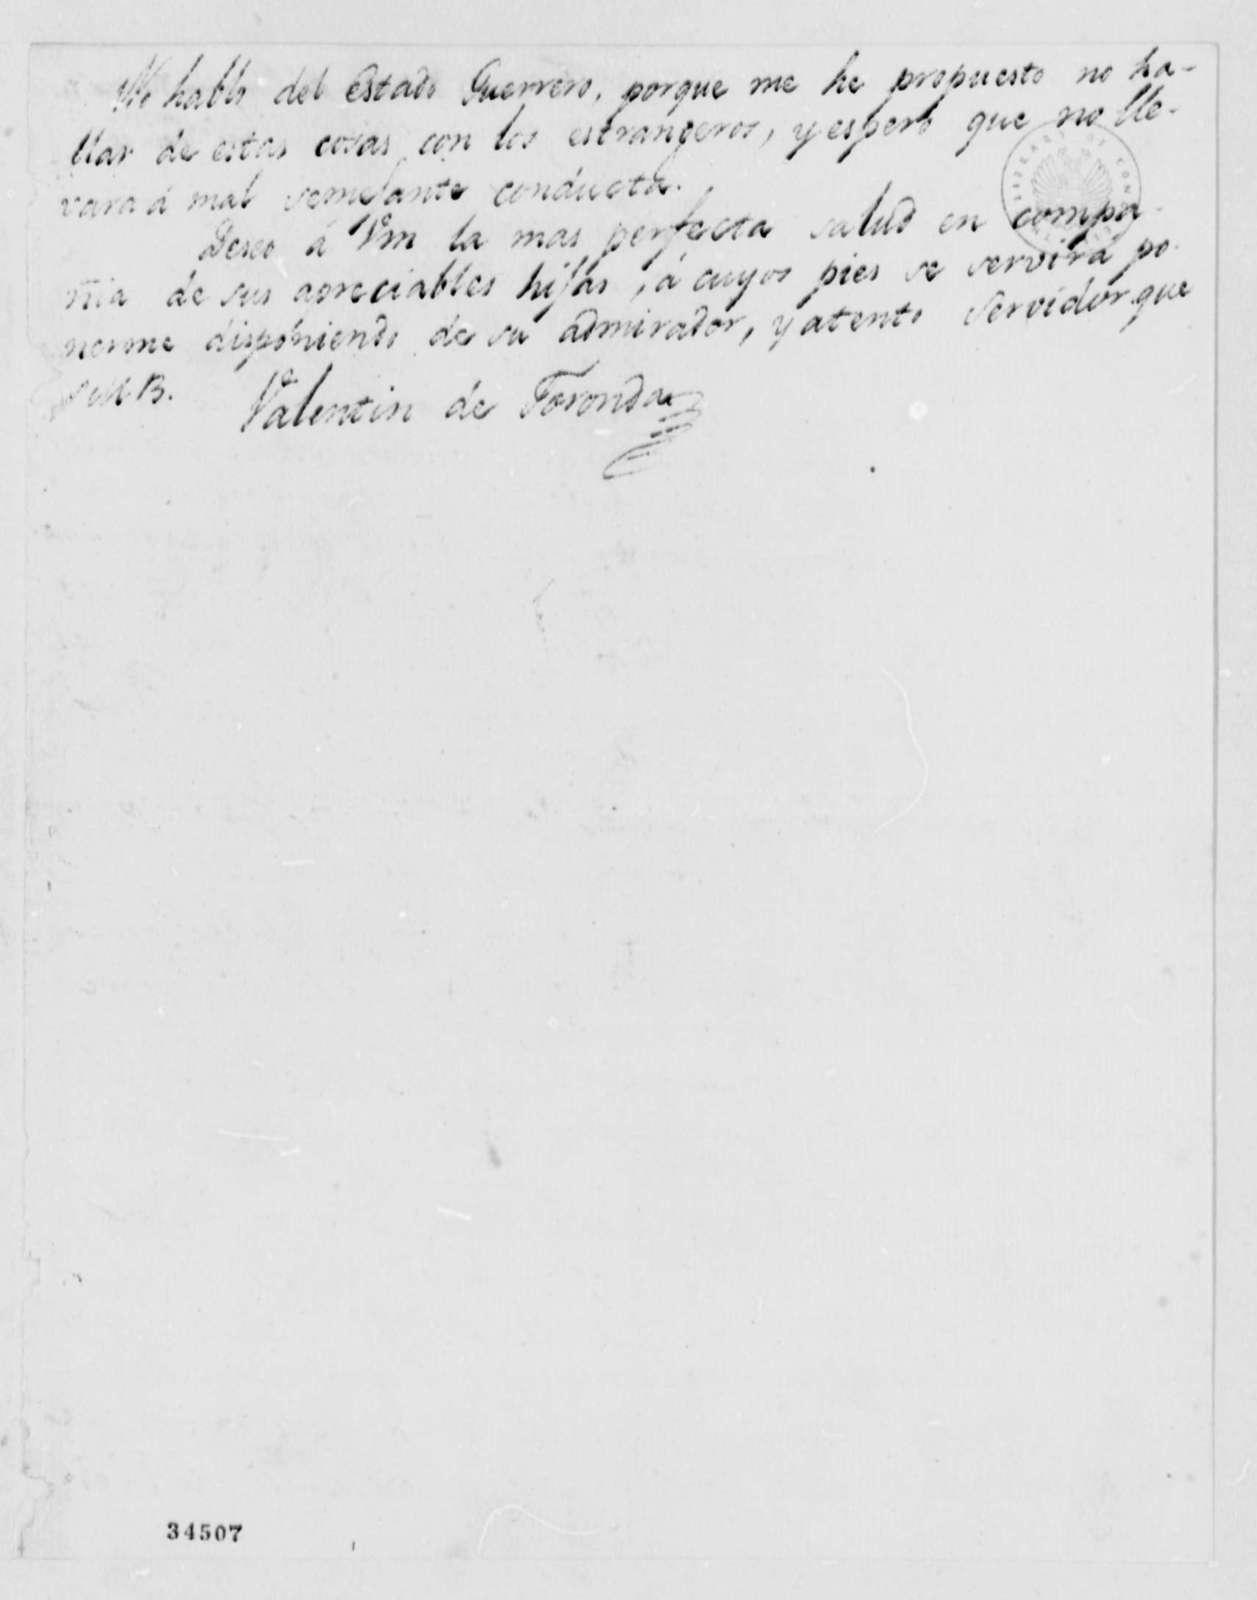 Valentin de Foronda to Thomas Jefferson, November 30, 1811, in Spanish